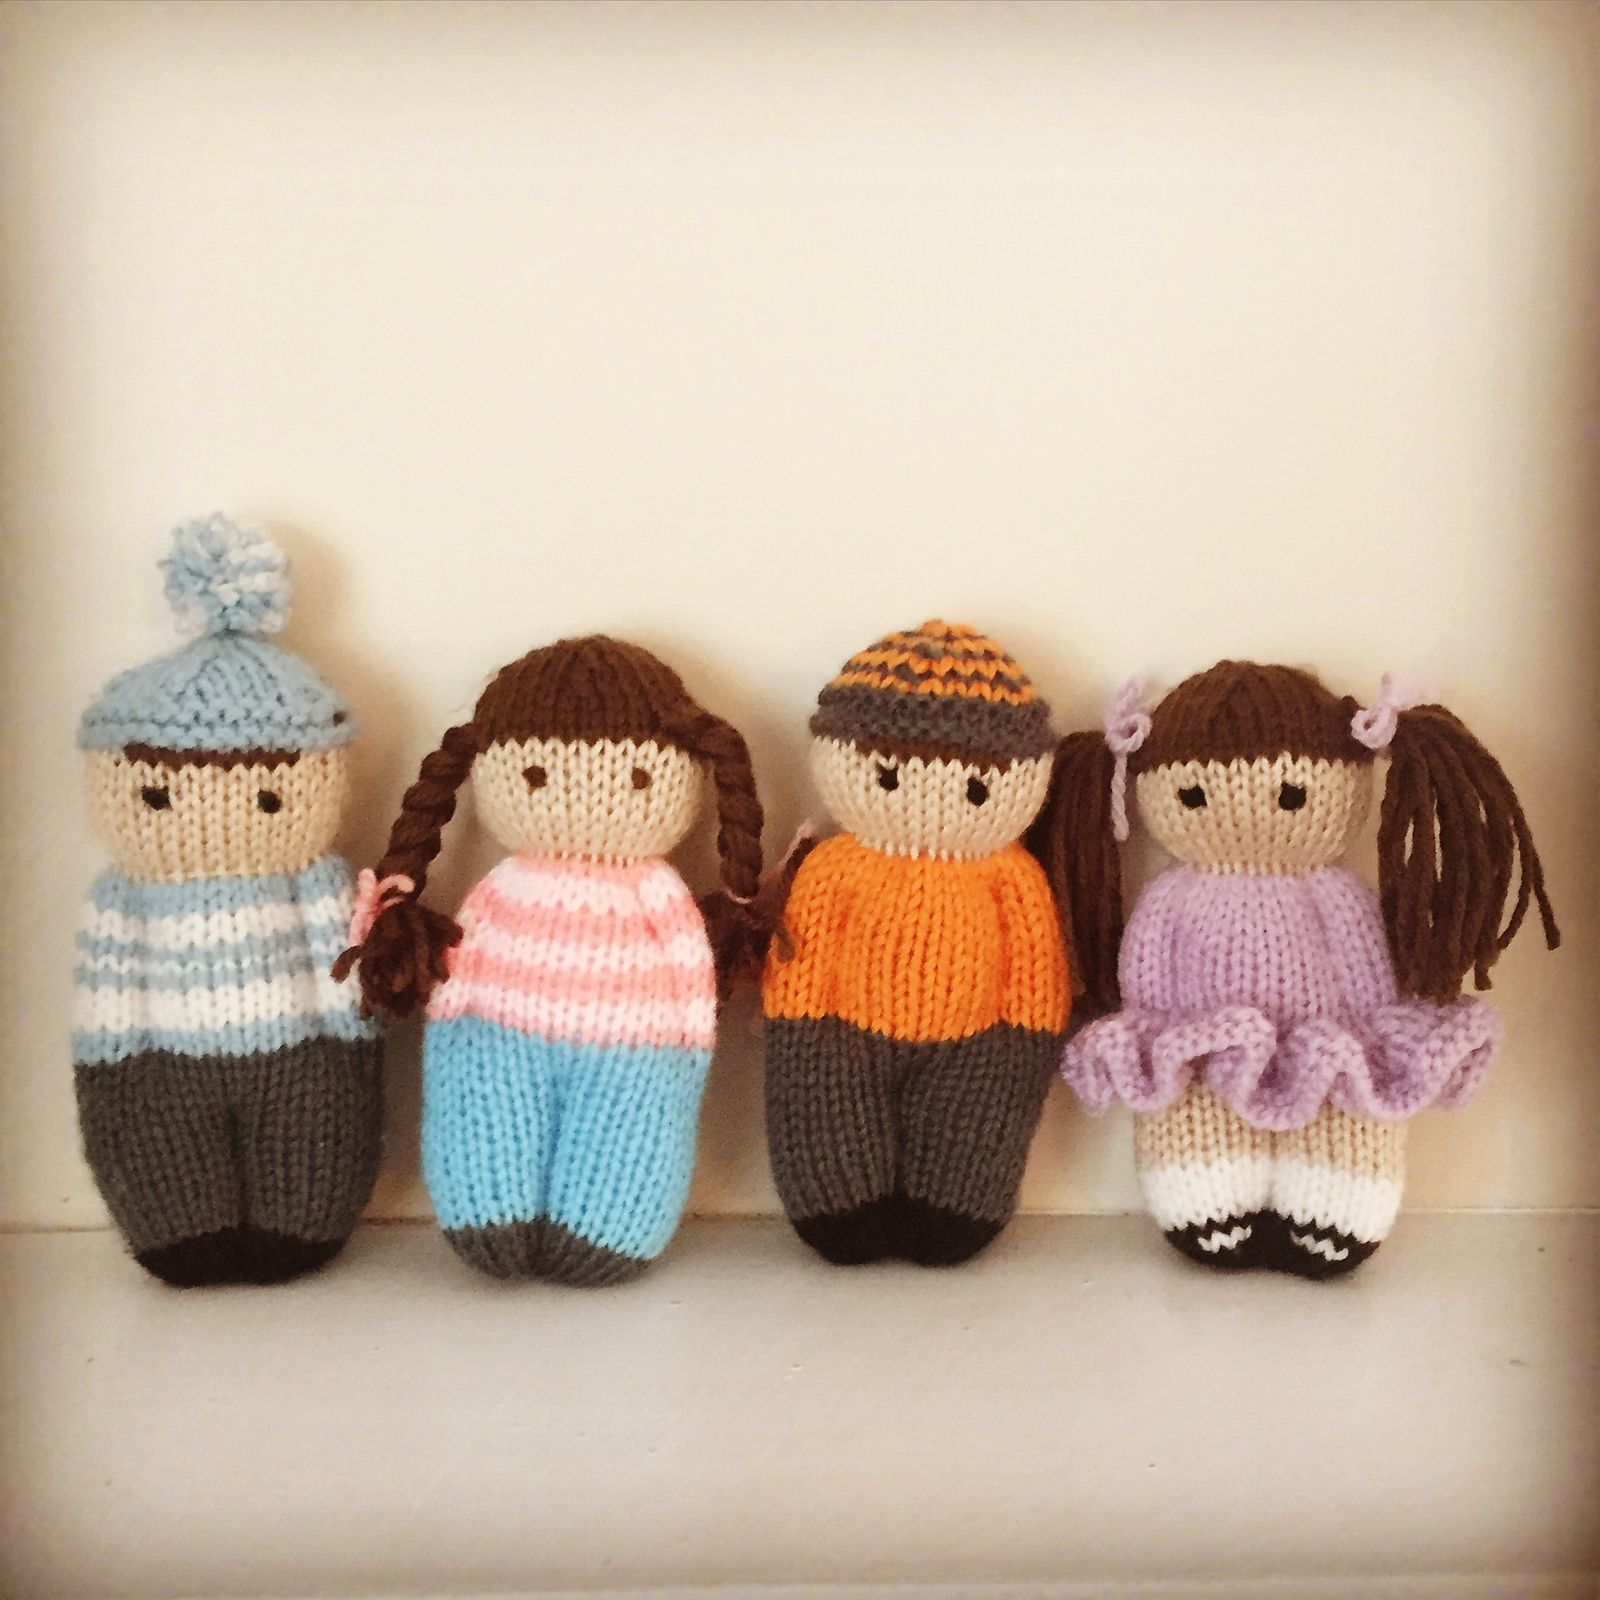 Ravelry: Amigurumi doll AkiNa by Jeslyn Sim | Amigurumi doll, Doll amigurumi  free pattern, Crochet doll pattern | 1600x1600